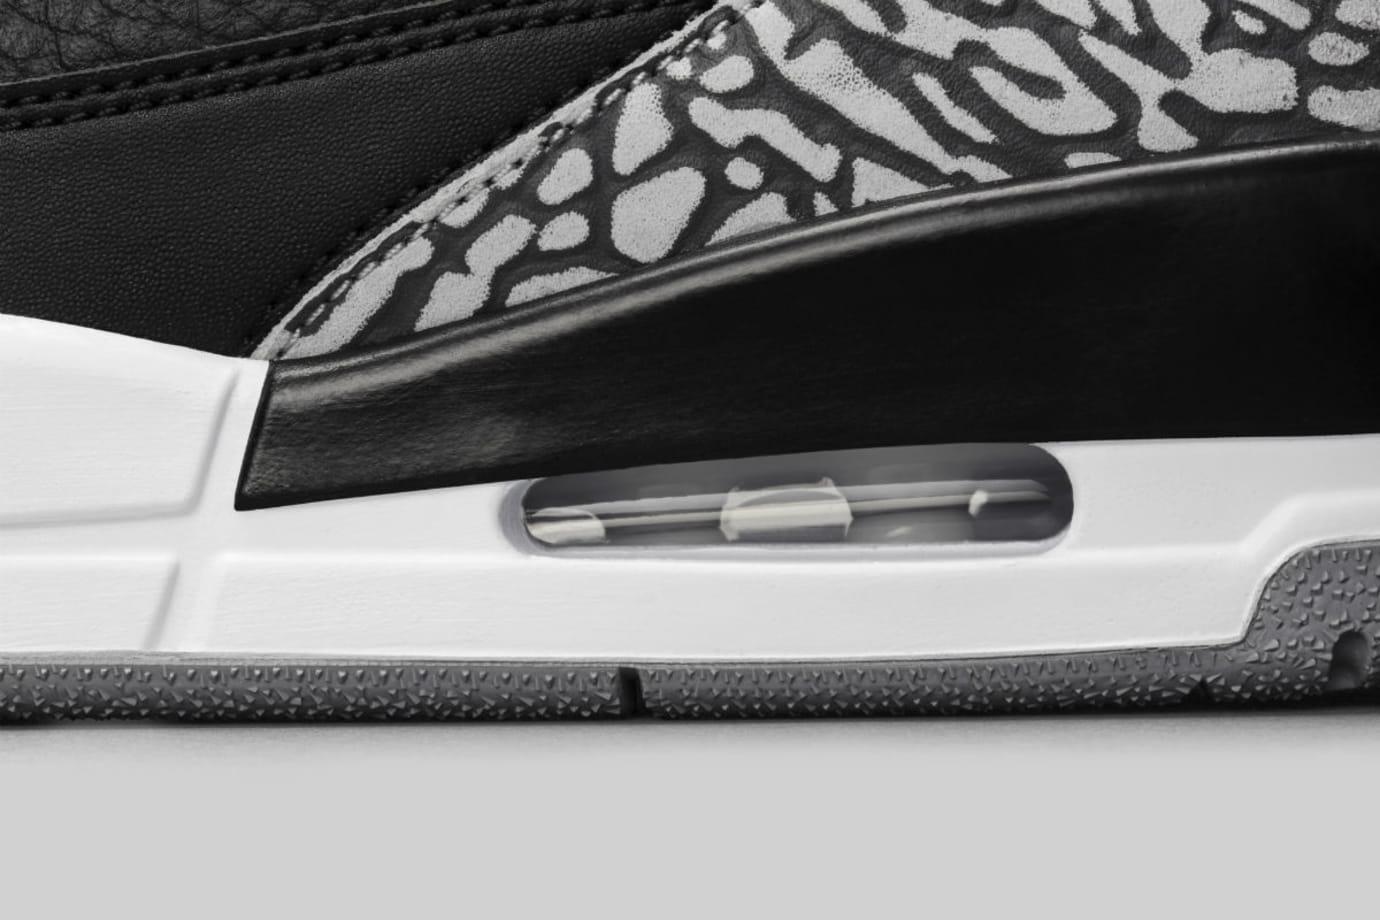 Air Jordan 3 III Black Cement Release Date 854262-001 Midsole